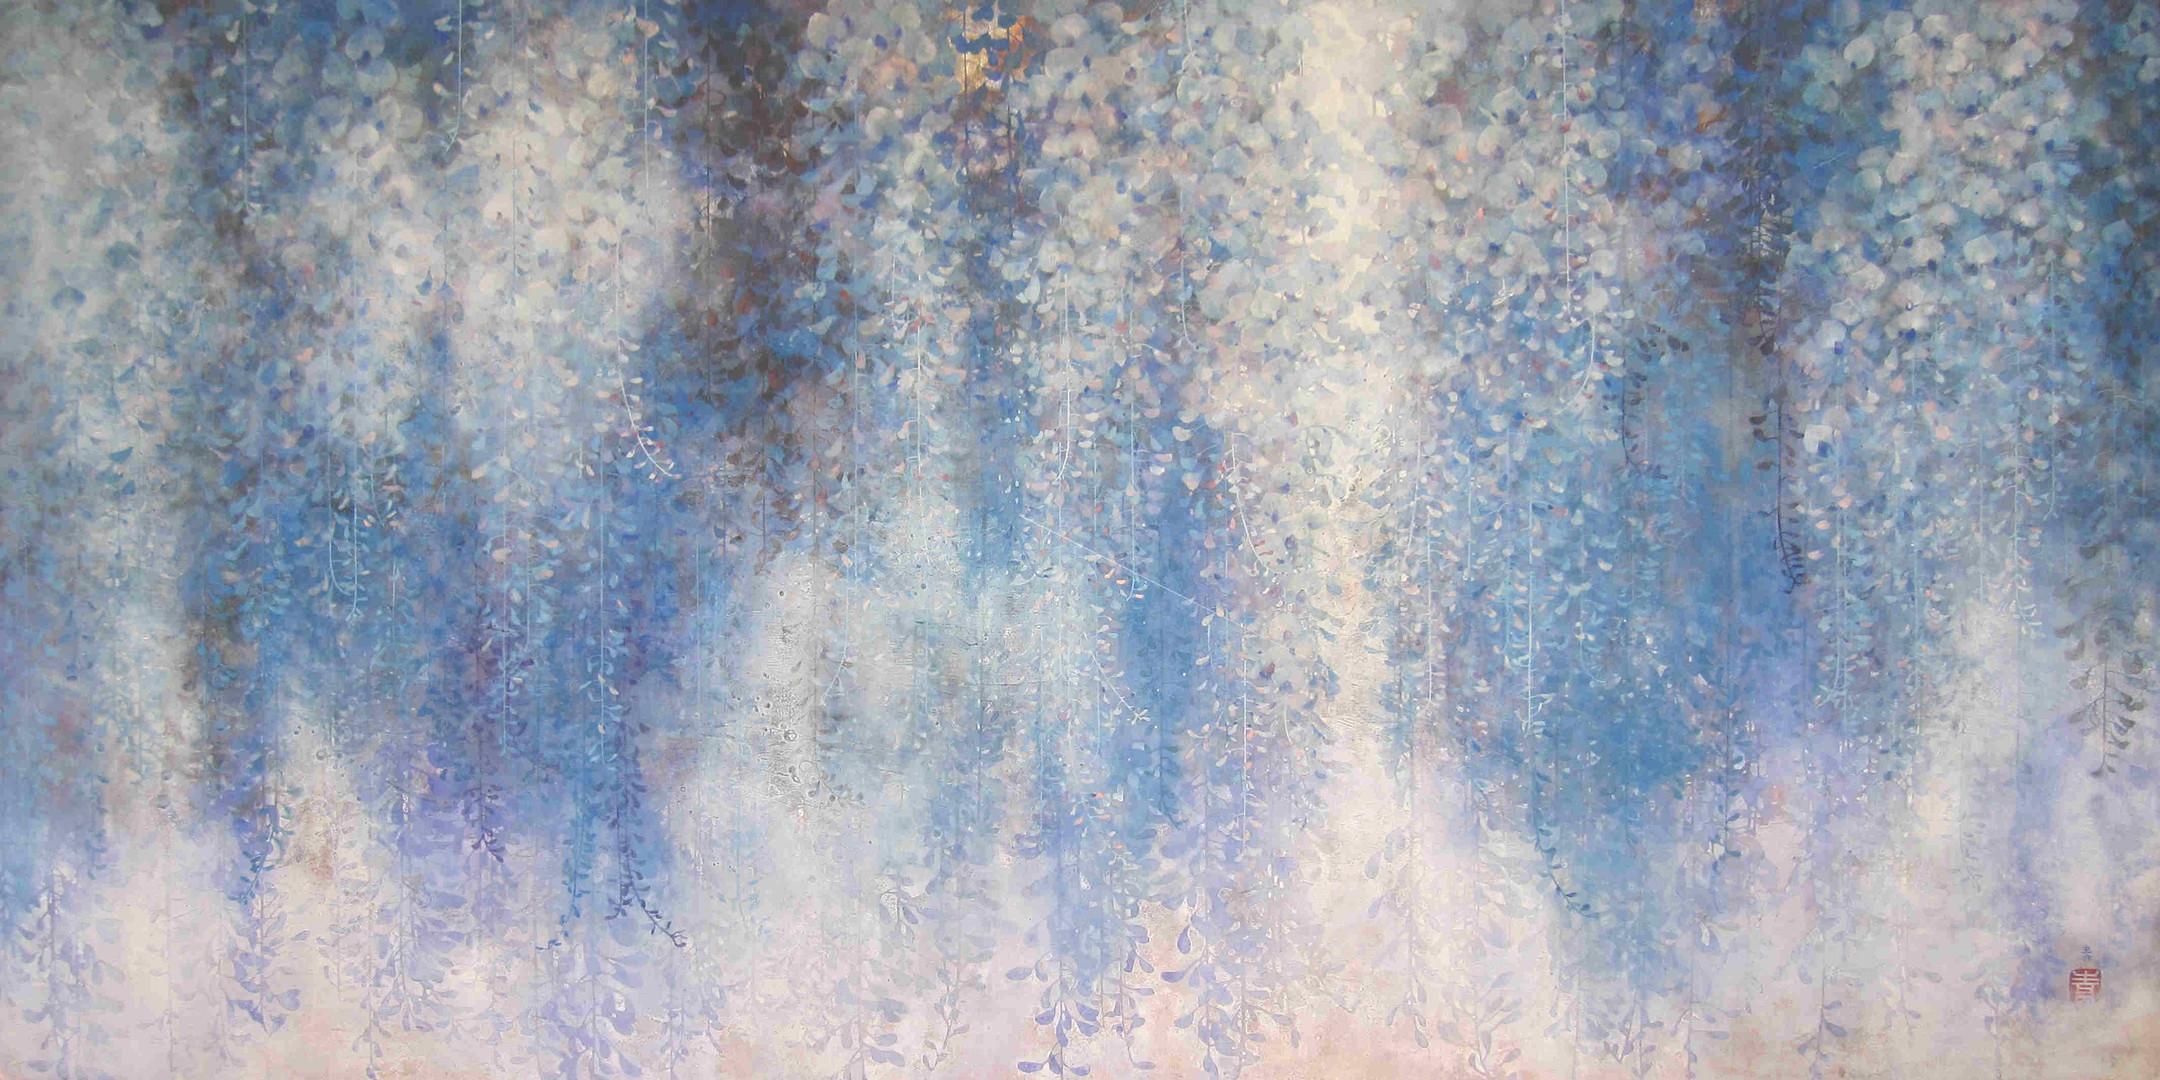 Voile printanier - 90 x 180 cm / 2012